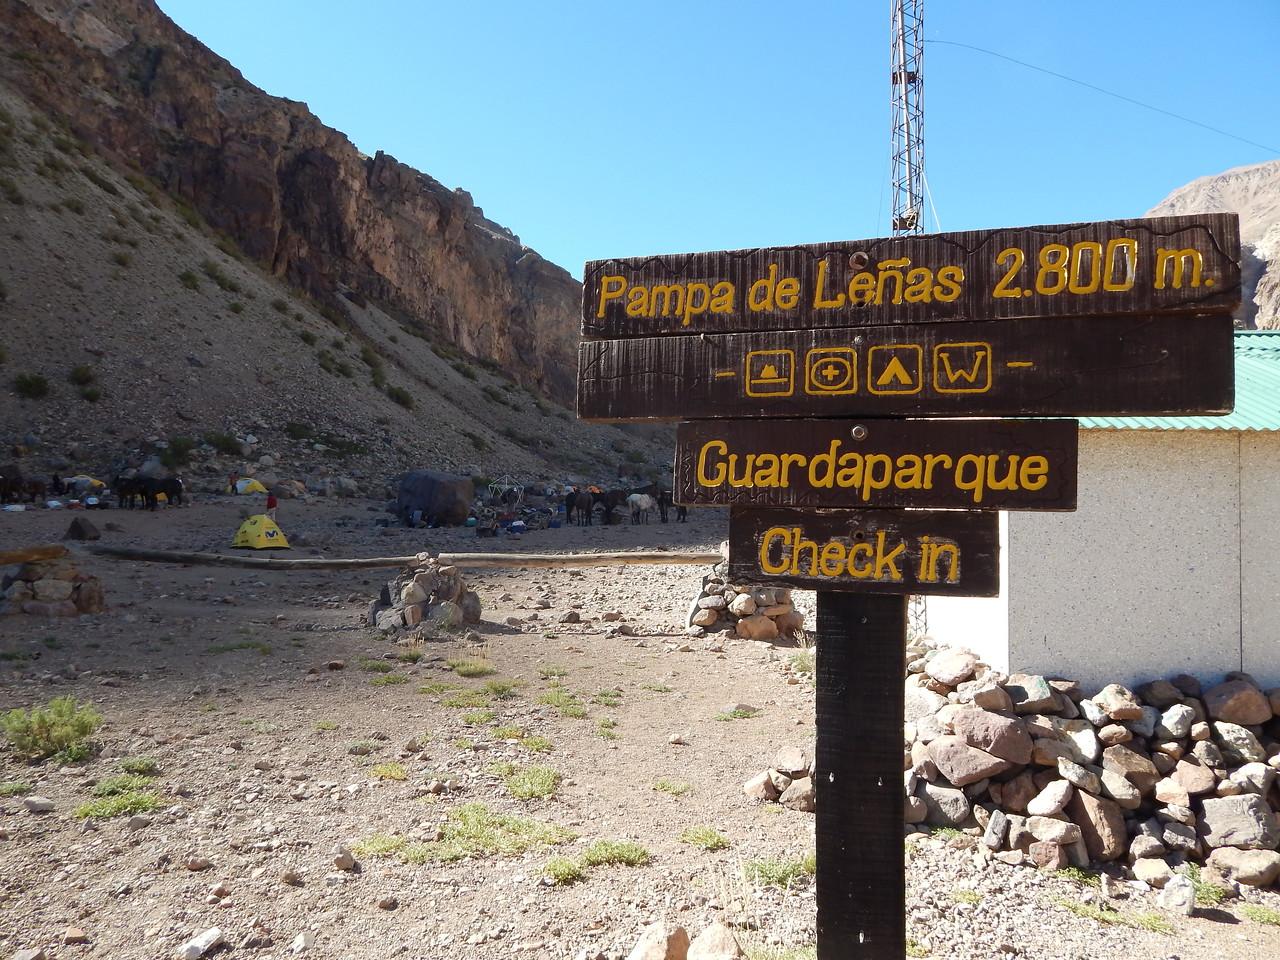 Day 1 first camp site, Pampa de Lenas